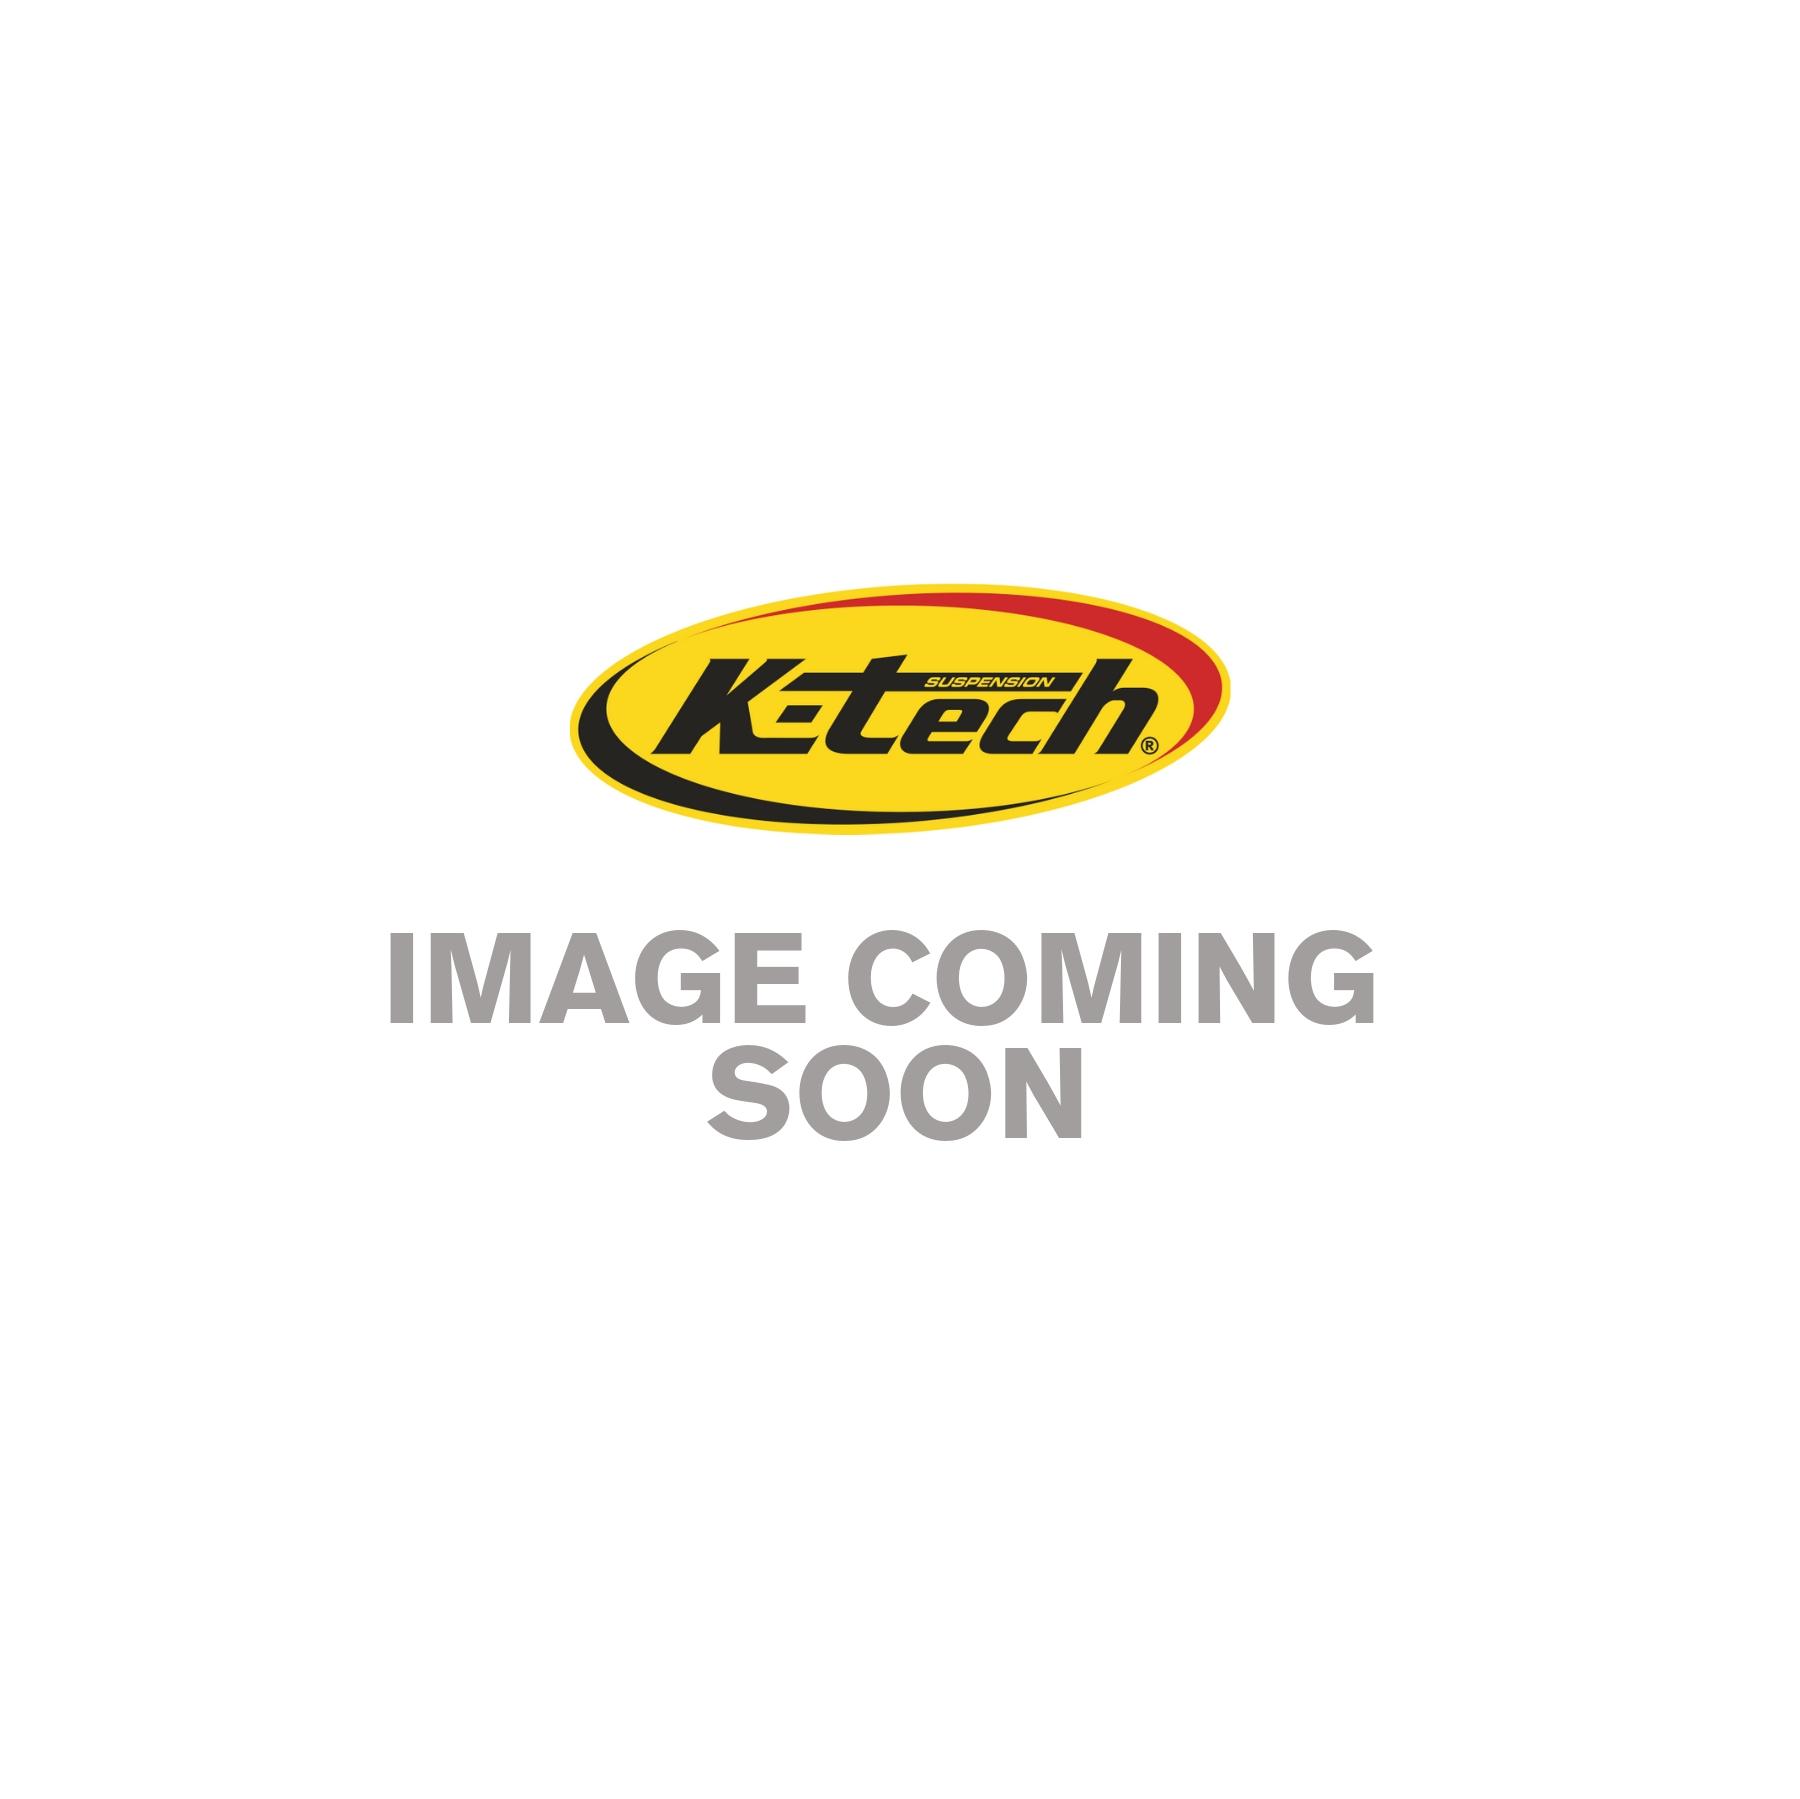 RDS Front Fork Cartridges Kawasaki ZX-6R 2005-2006 Showa